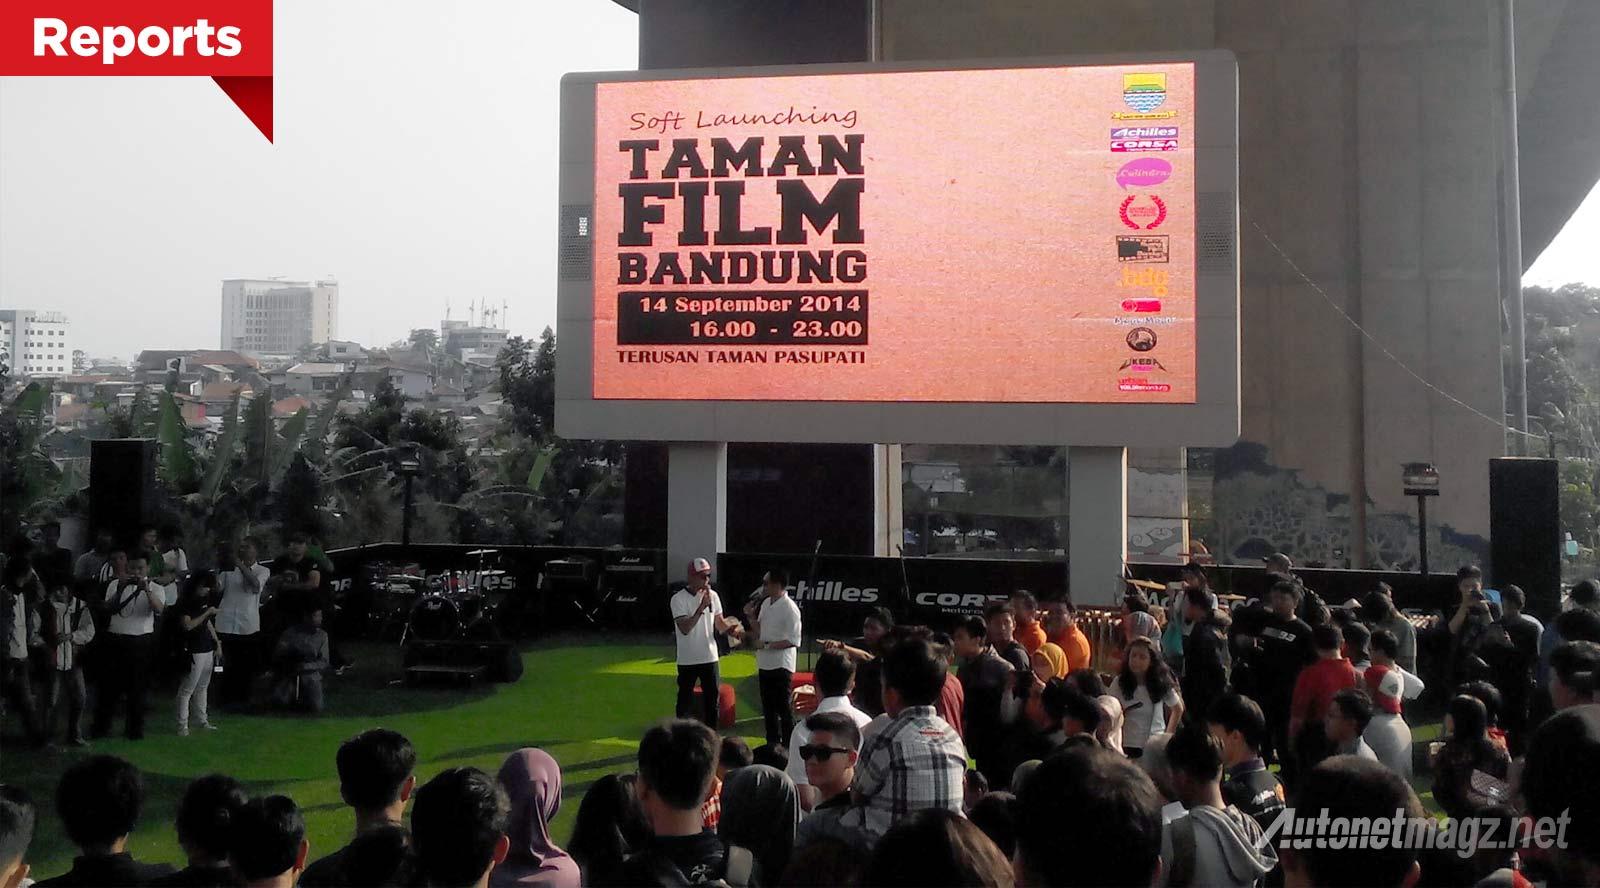 Yuk Mengintip Taman Unik Bandung Csrhub Indonesia Pasupati Kab